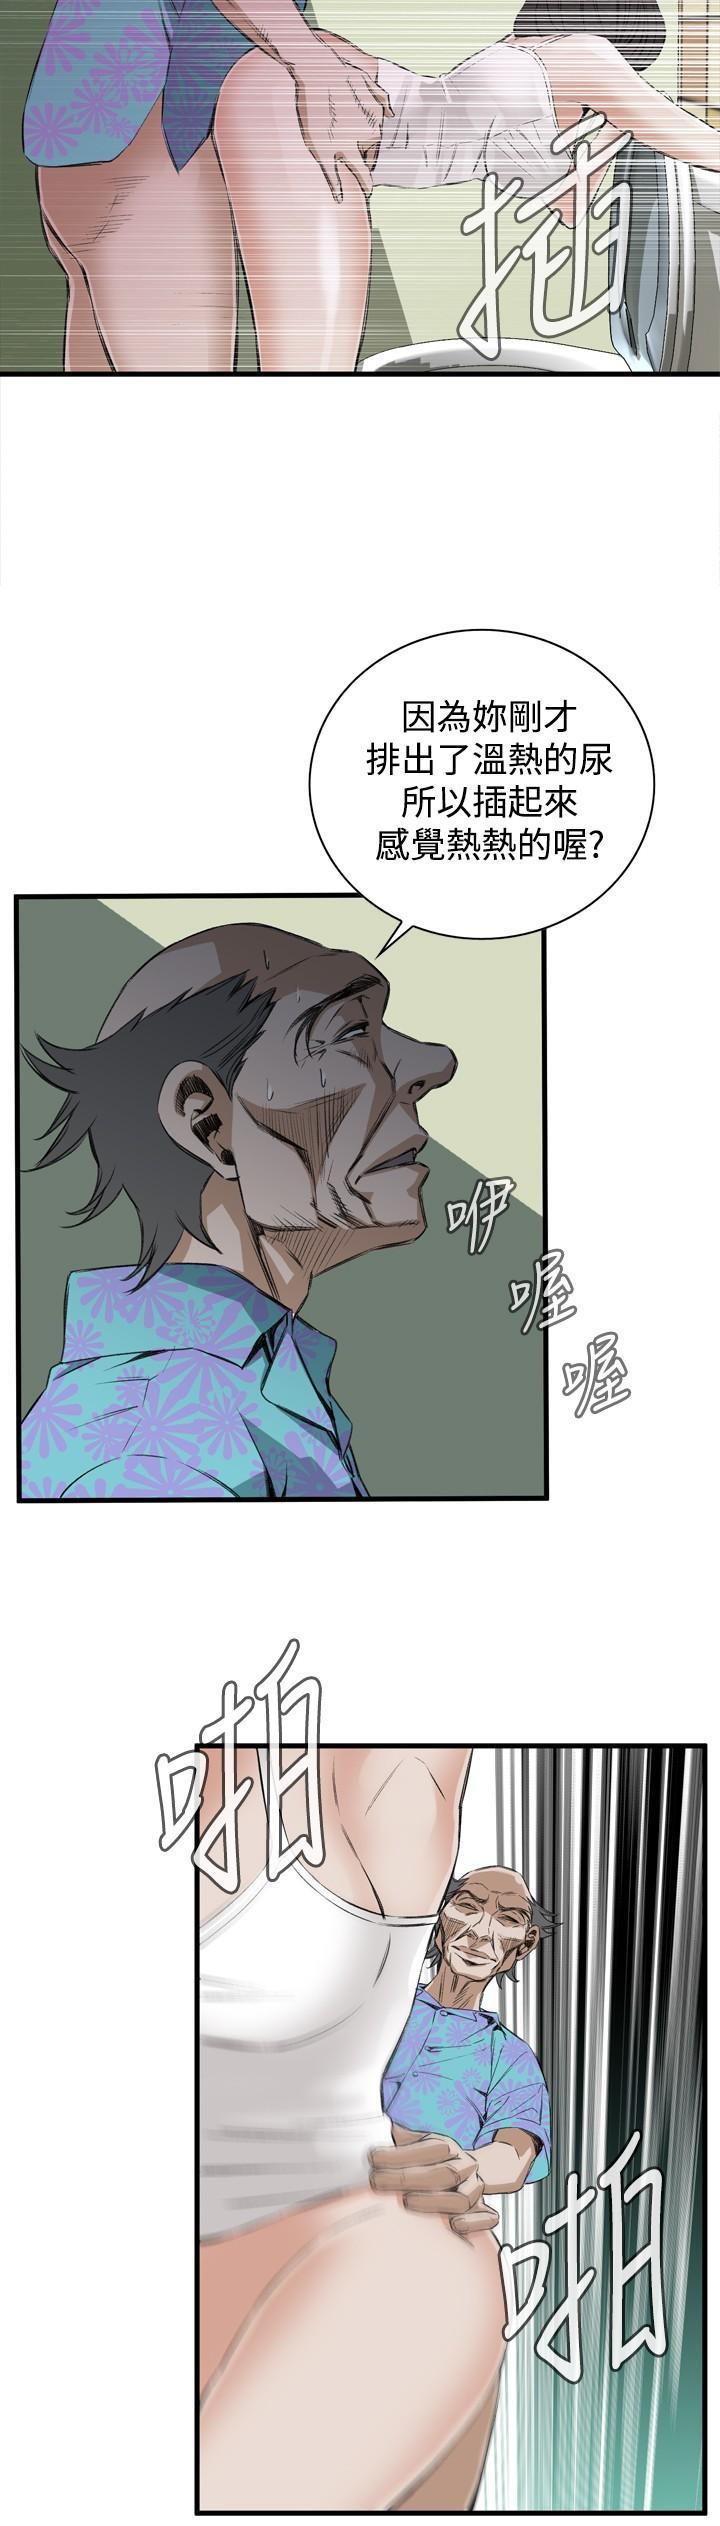 Take a Peek 偷窥 Ch.39~55 [Chinese]中文 275